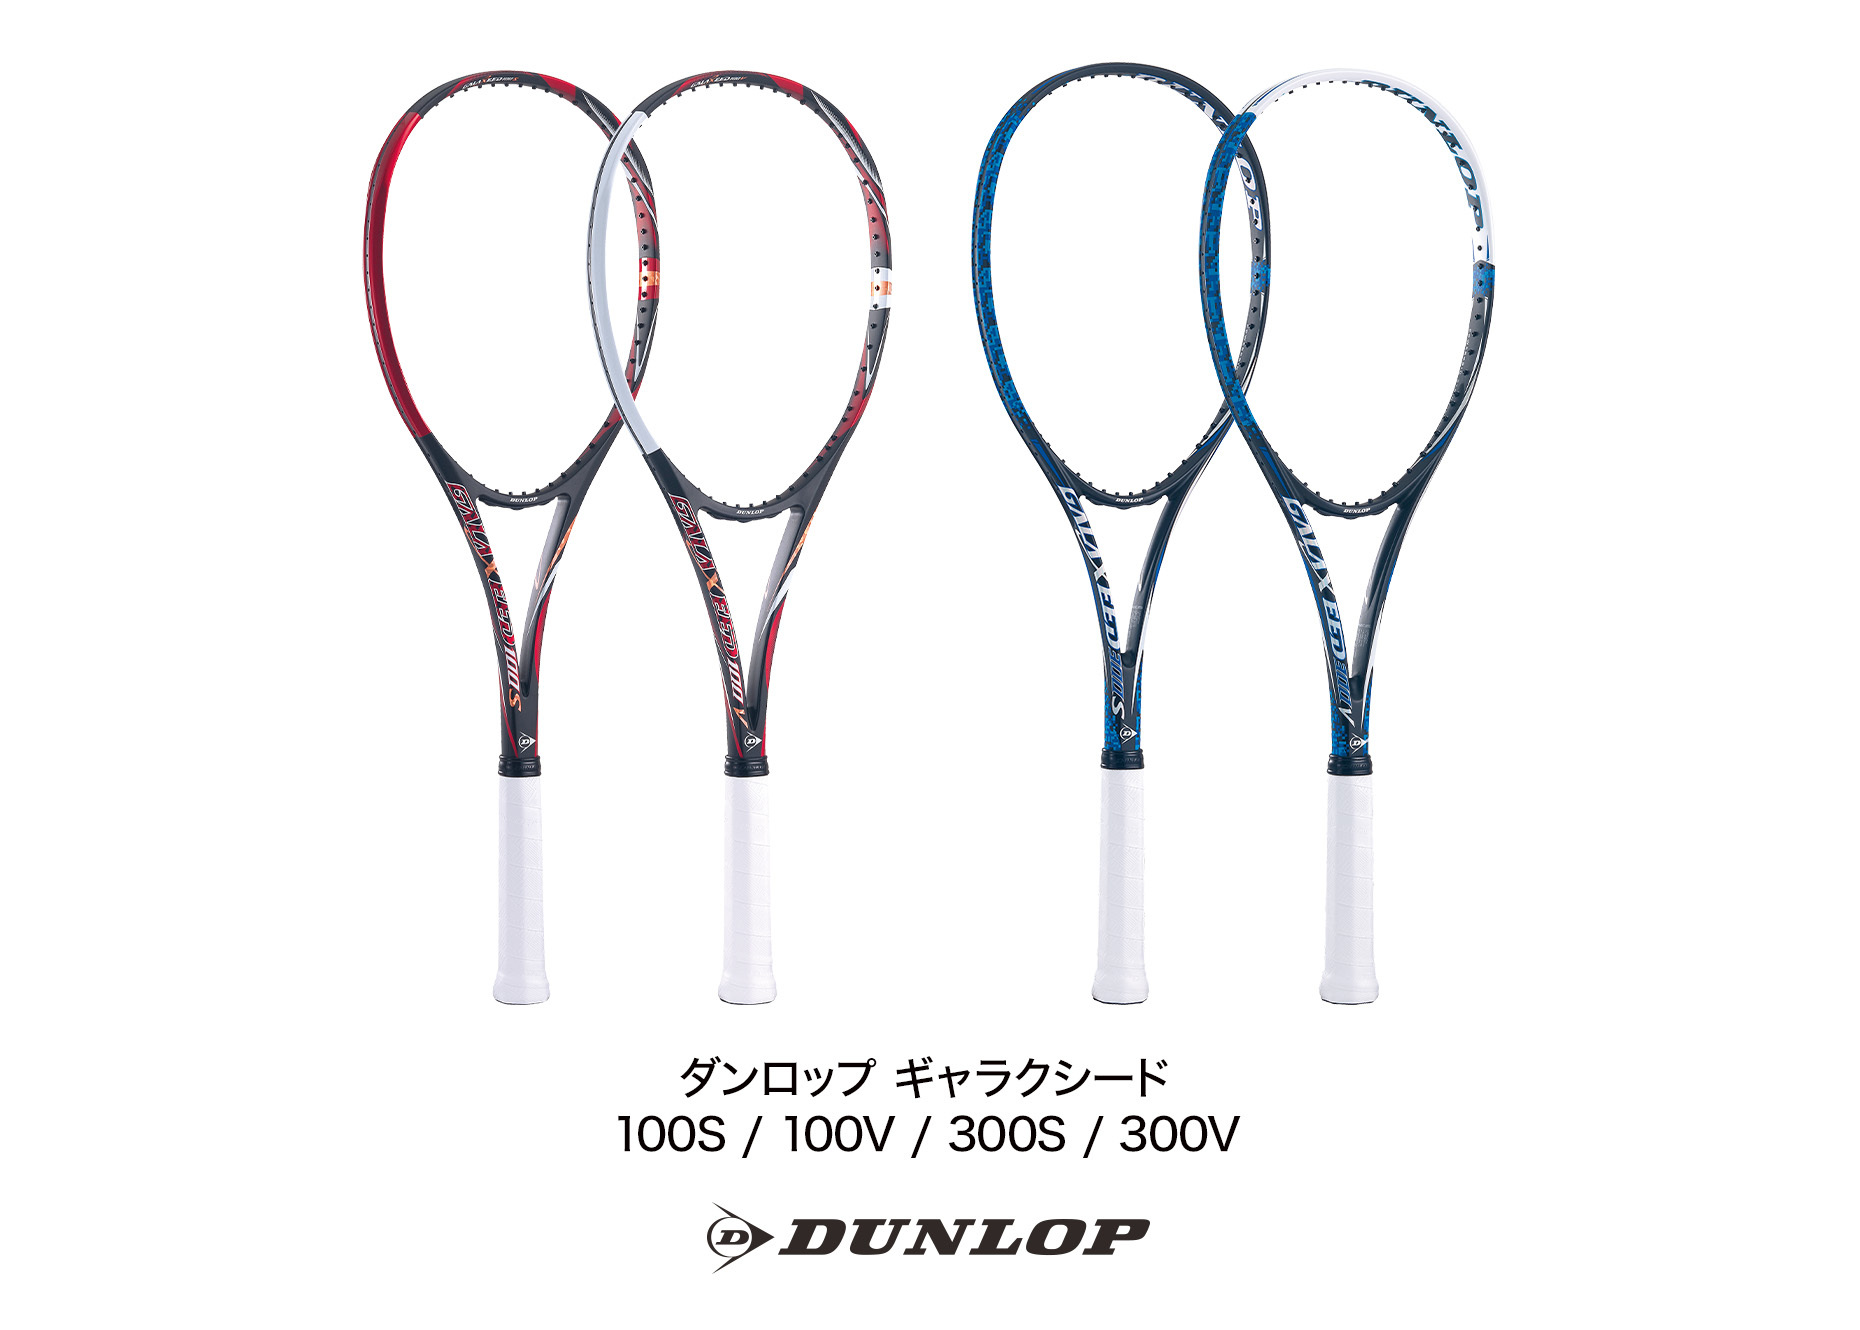 4f85c6acc6bcea ソフトテニスラケットGALAXEEDシリーズを新発売 (2019年6月25日) - エキサイトニュース